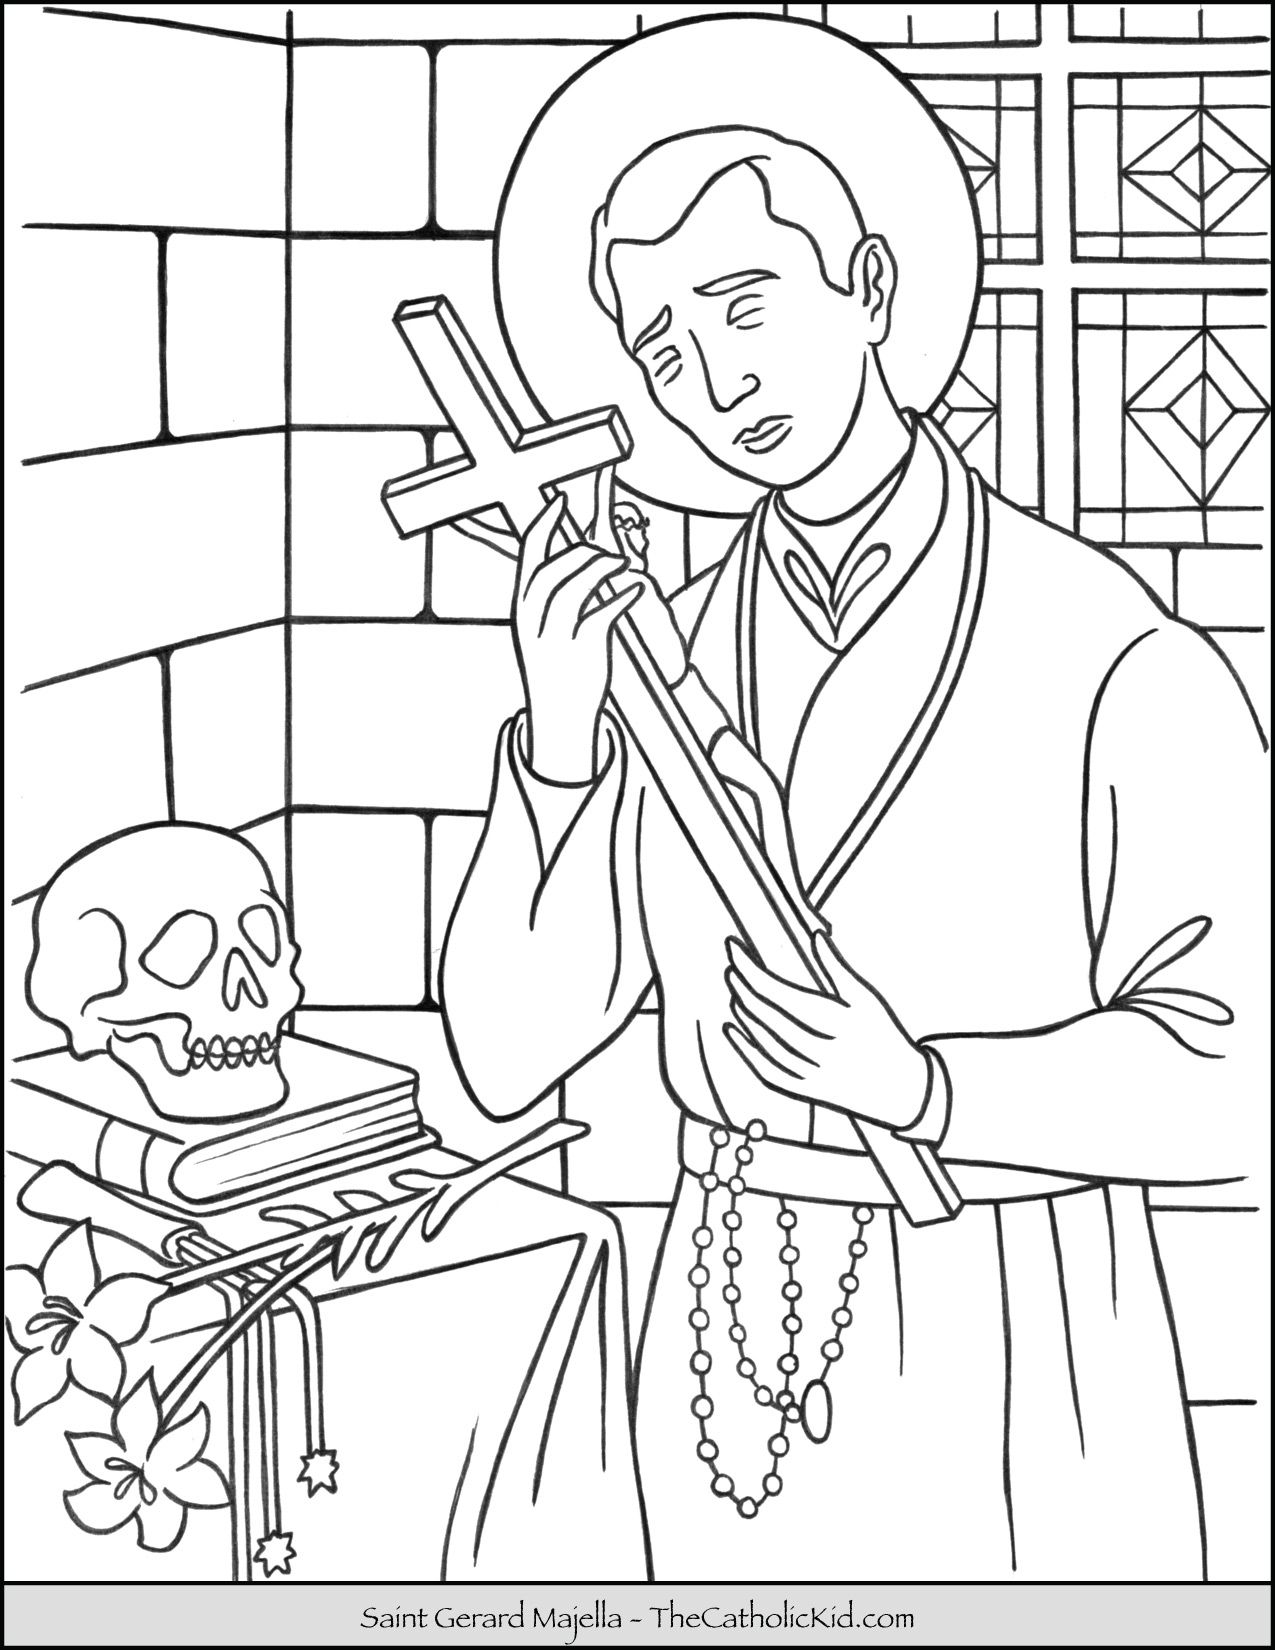 Saint Gerard Majella Coloring Page Thecatholickid Com St